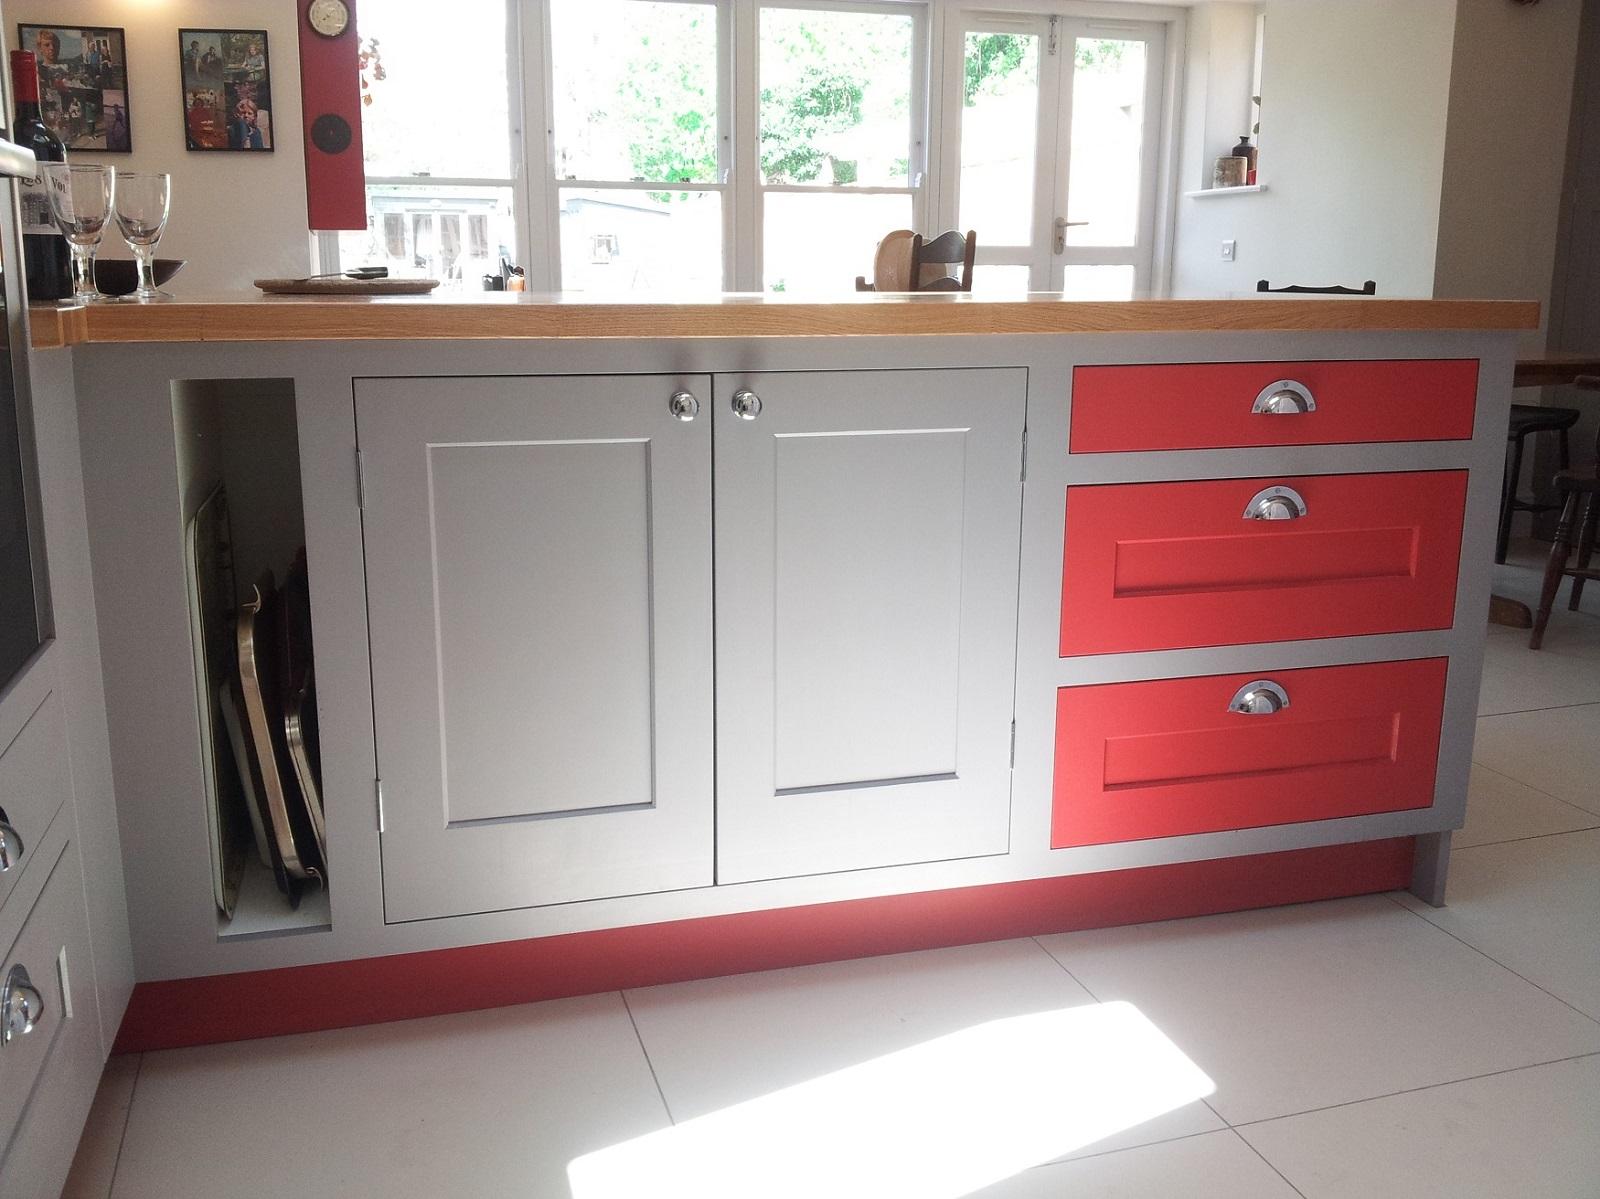 painted kitchen bespoke oxford oak worktops eye level oven oxfordshire